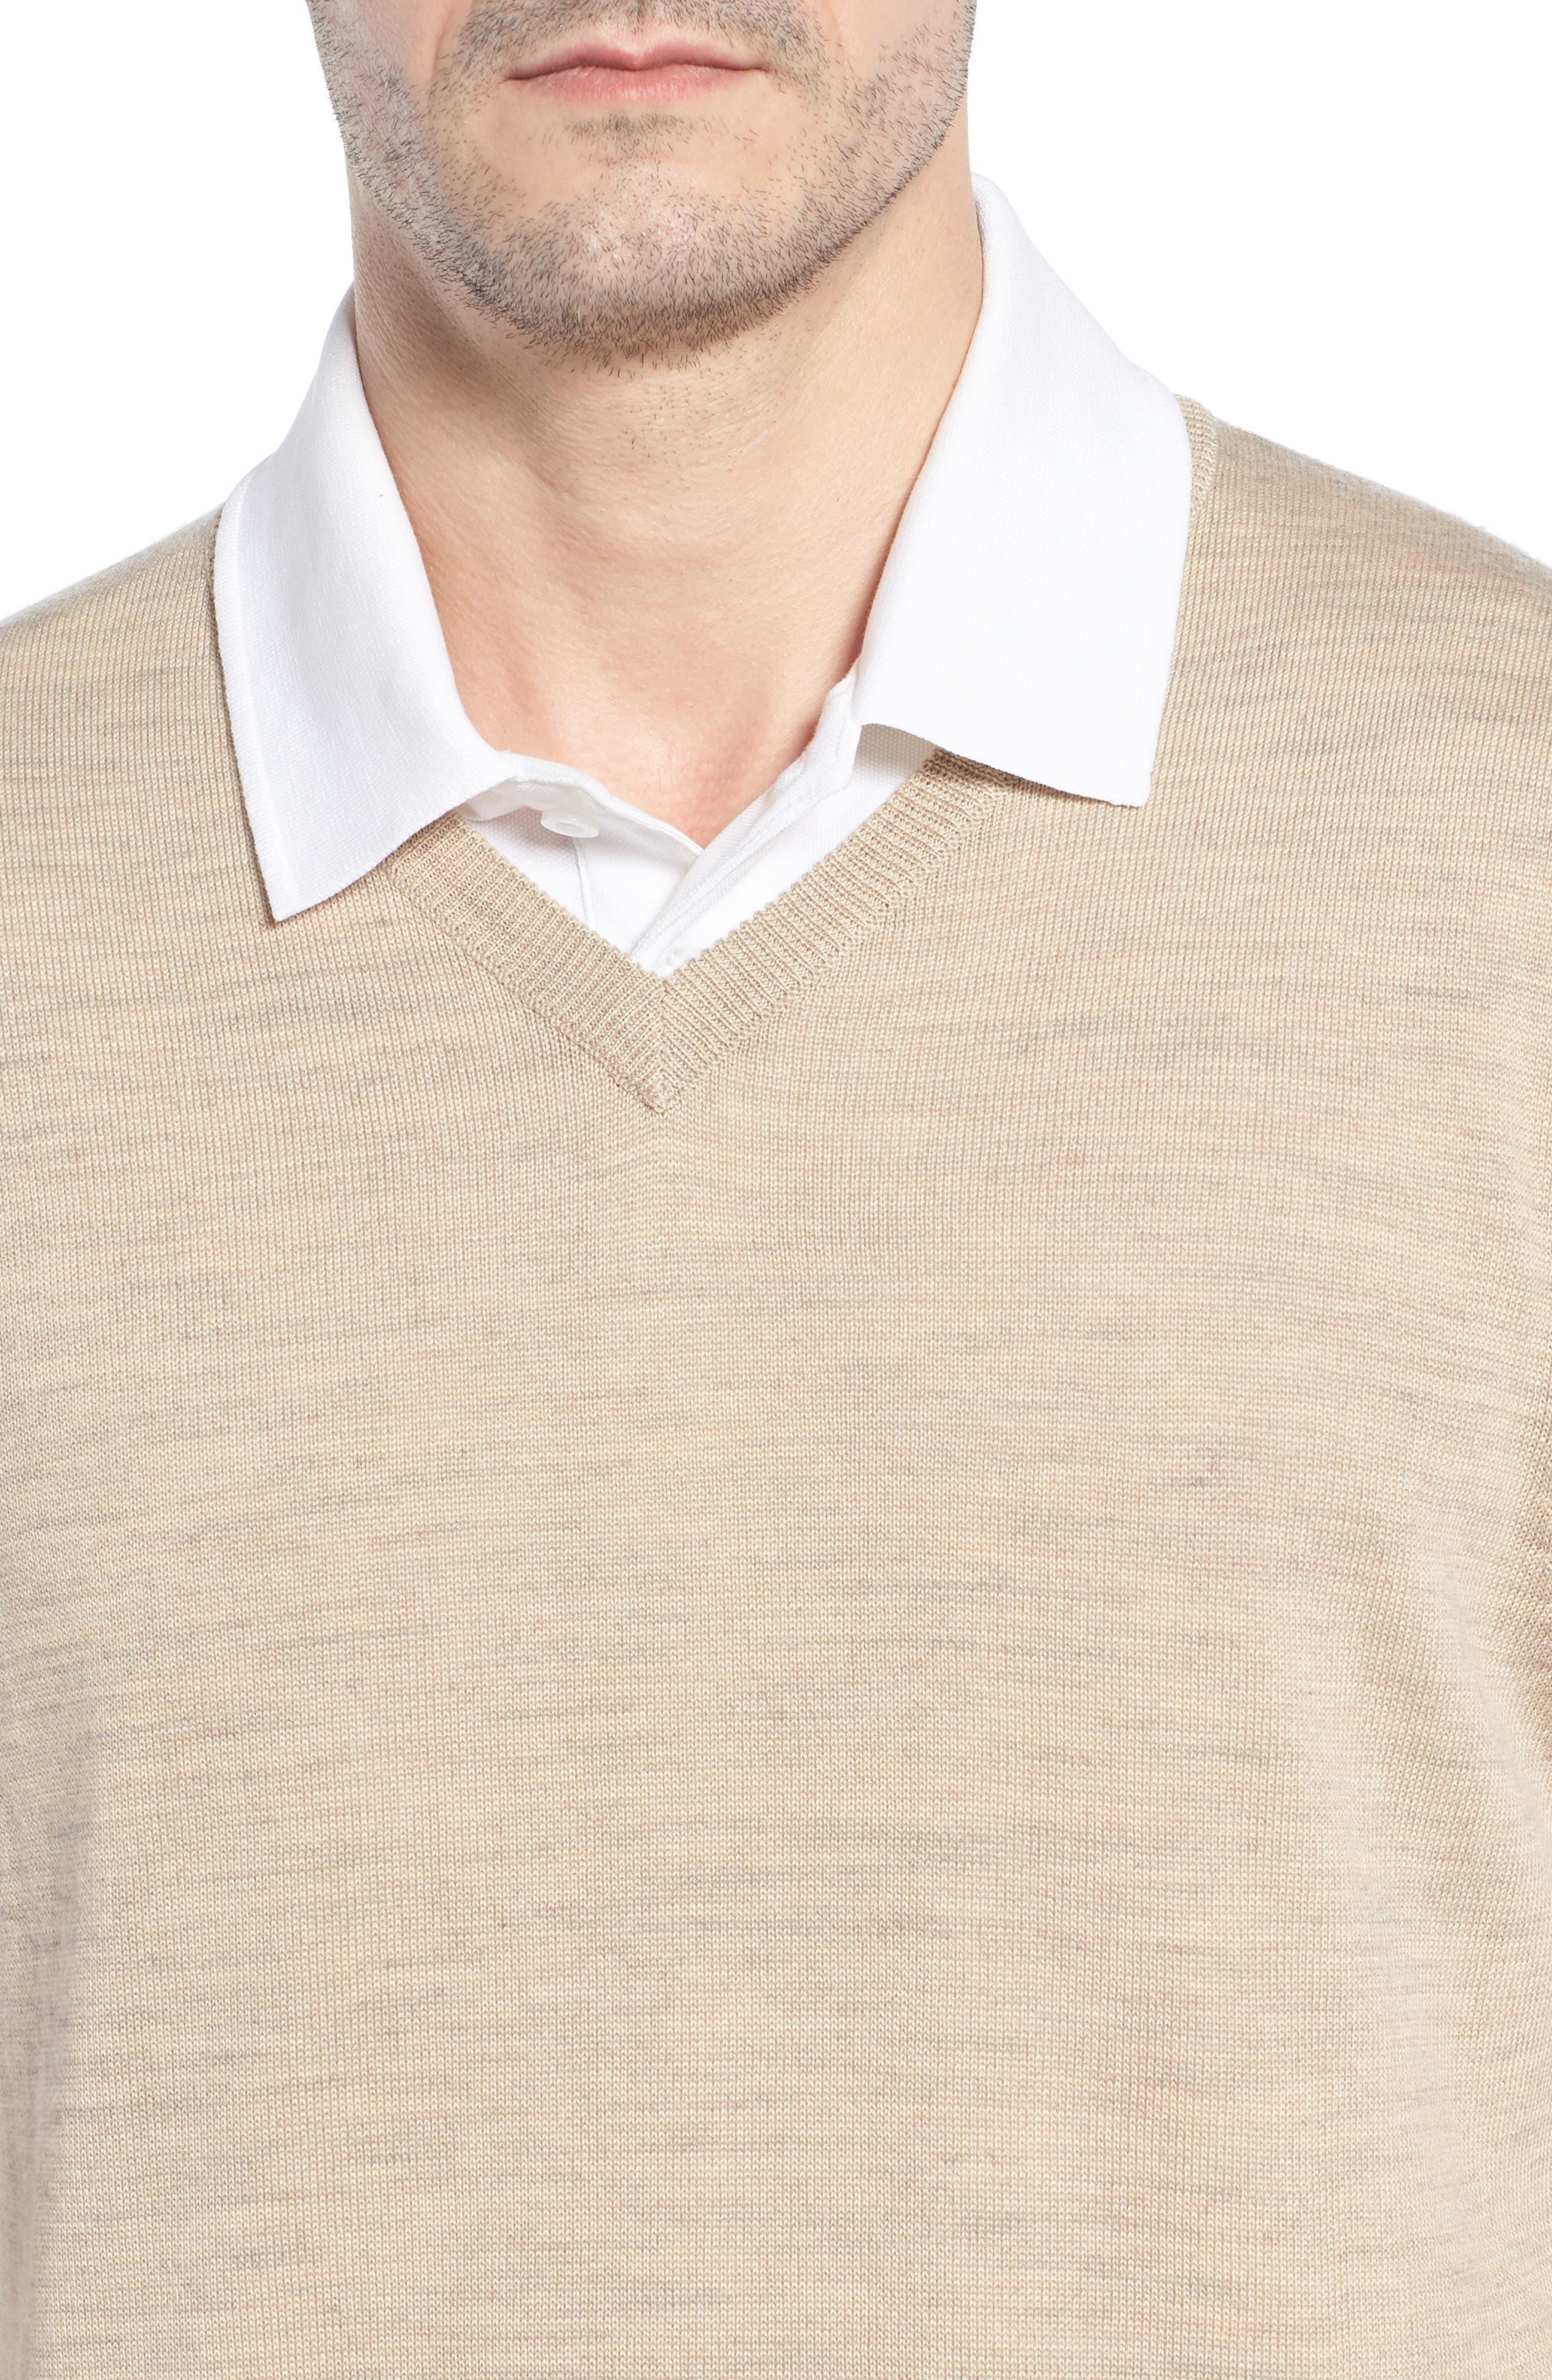 CUTTER & BUCK, 'Douglas' Merino Wool Blend V-Neck Sweater Vest, Alternate thumbnail 4, color, SAND HEATHER